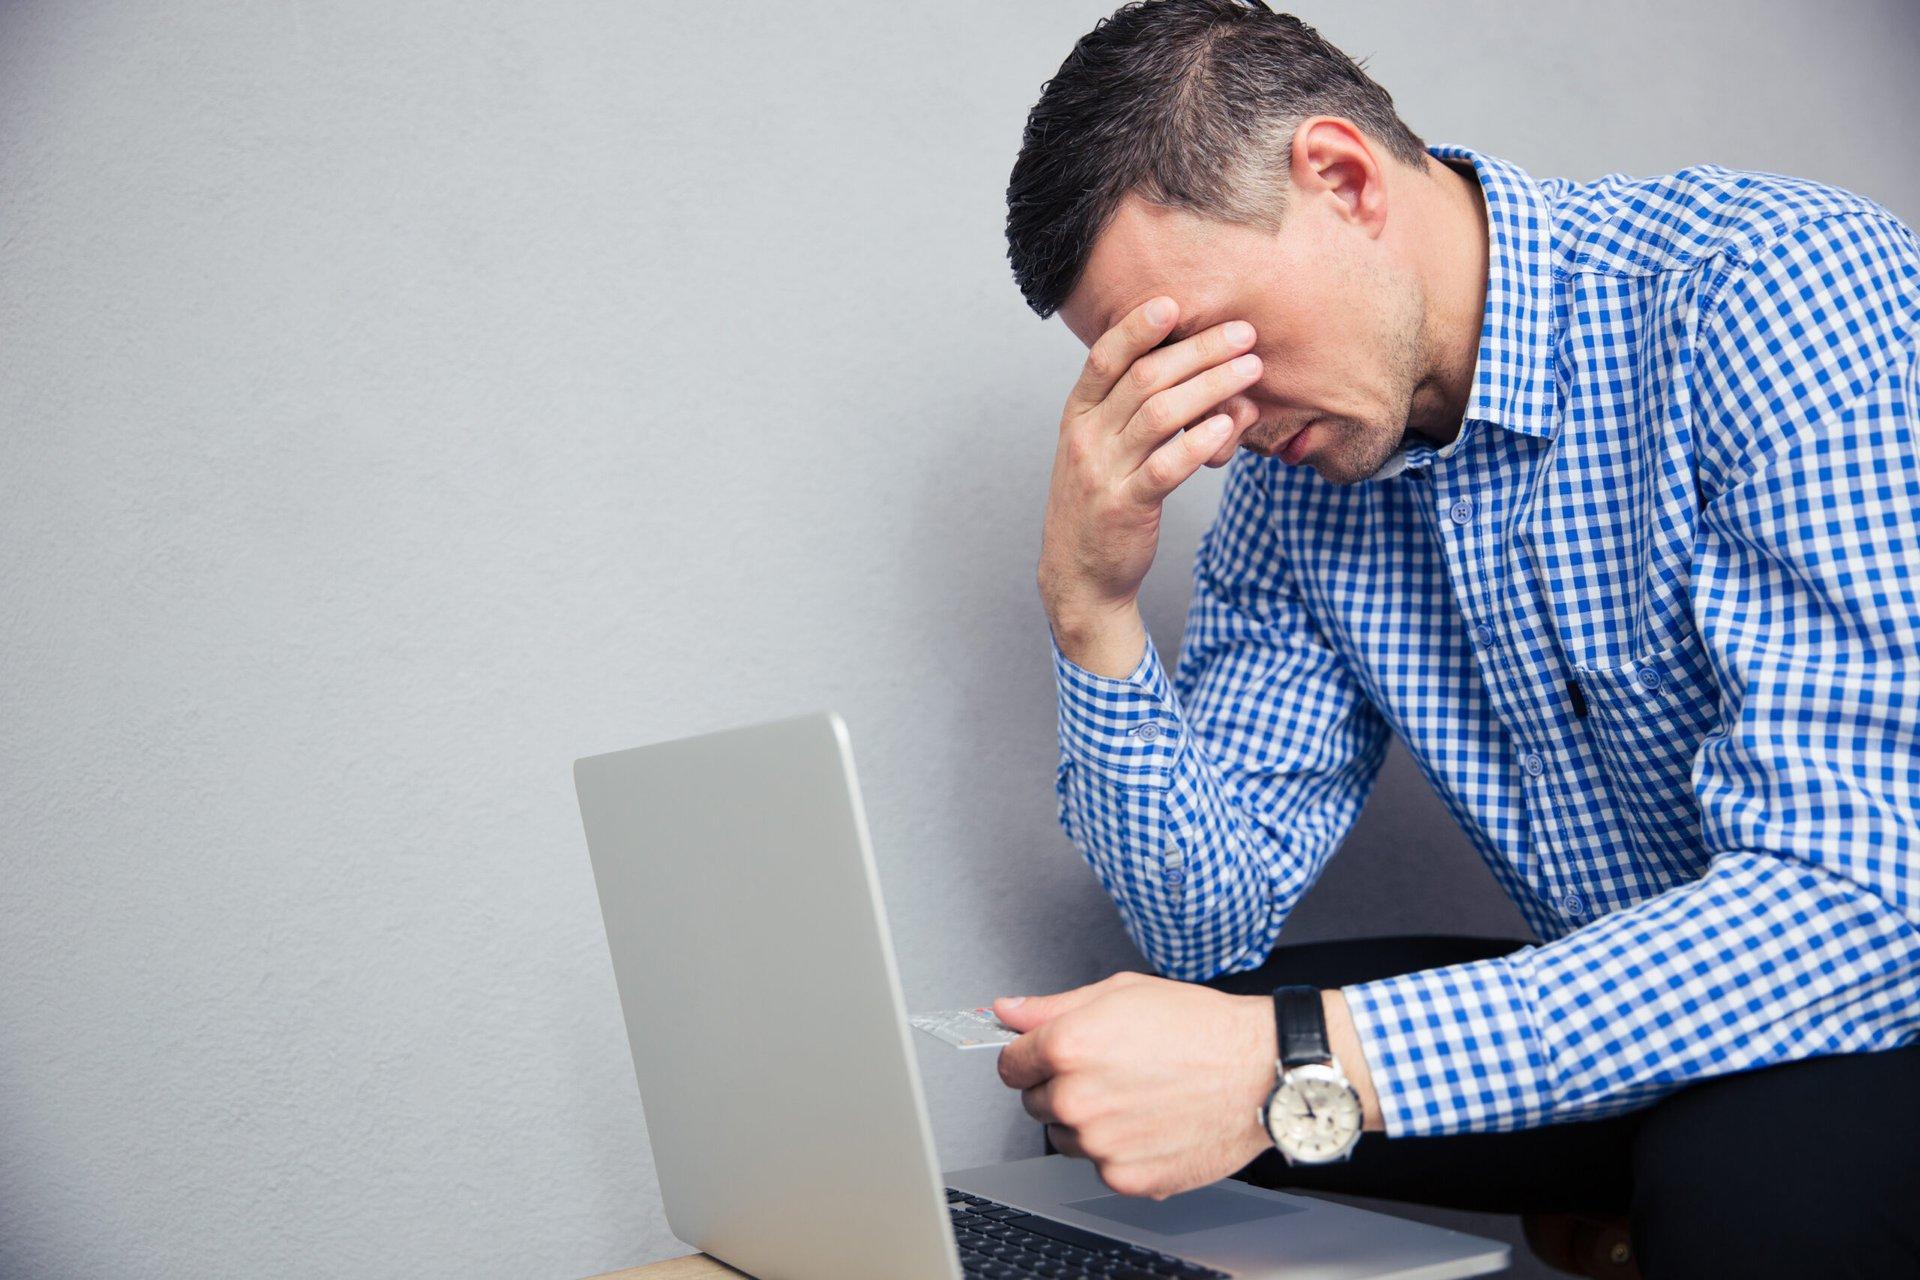 Man worried about data breach